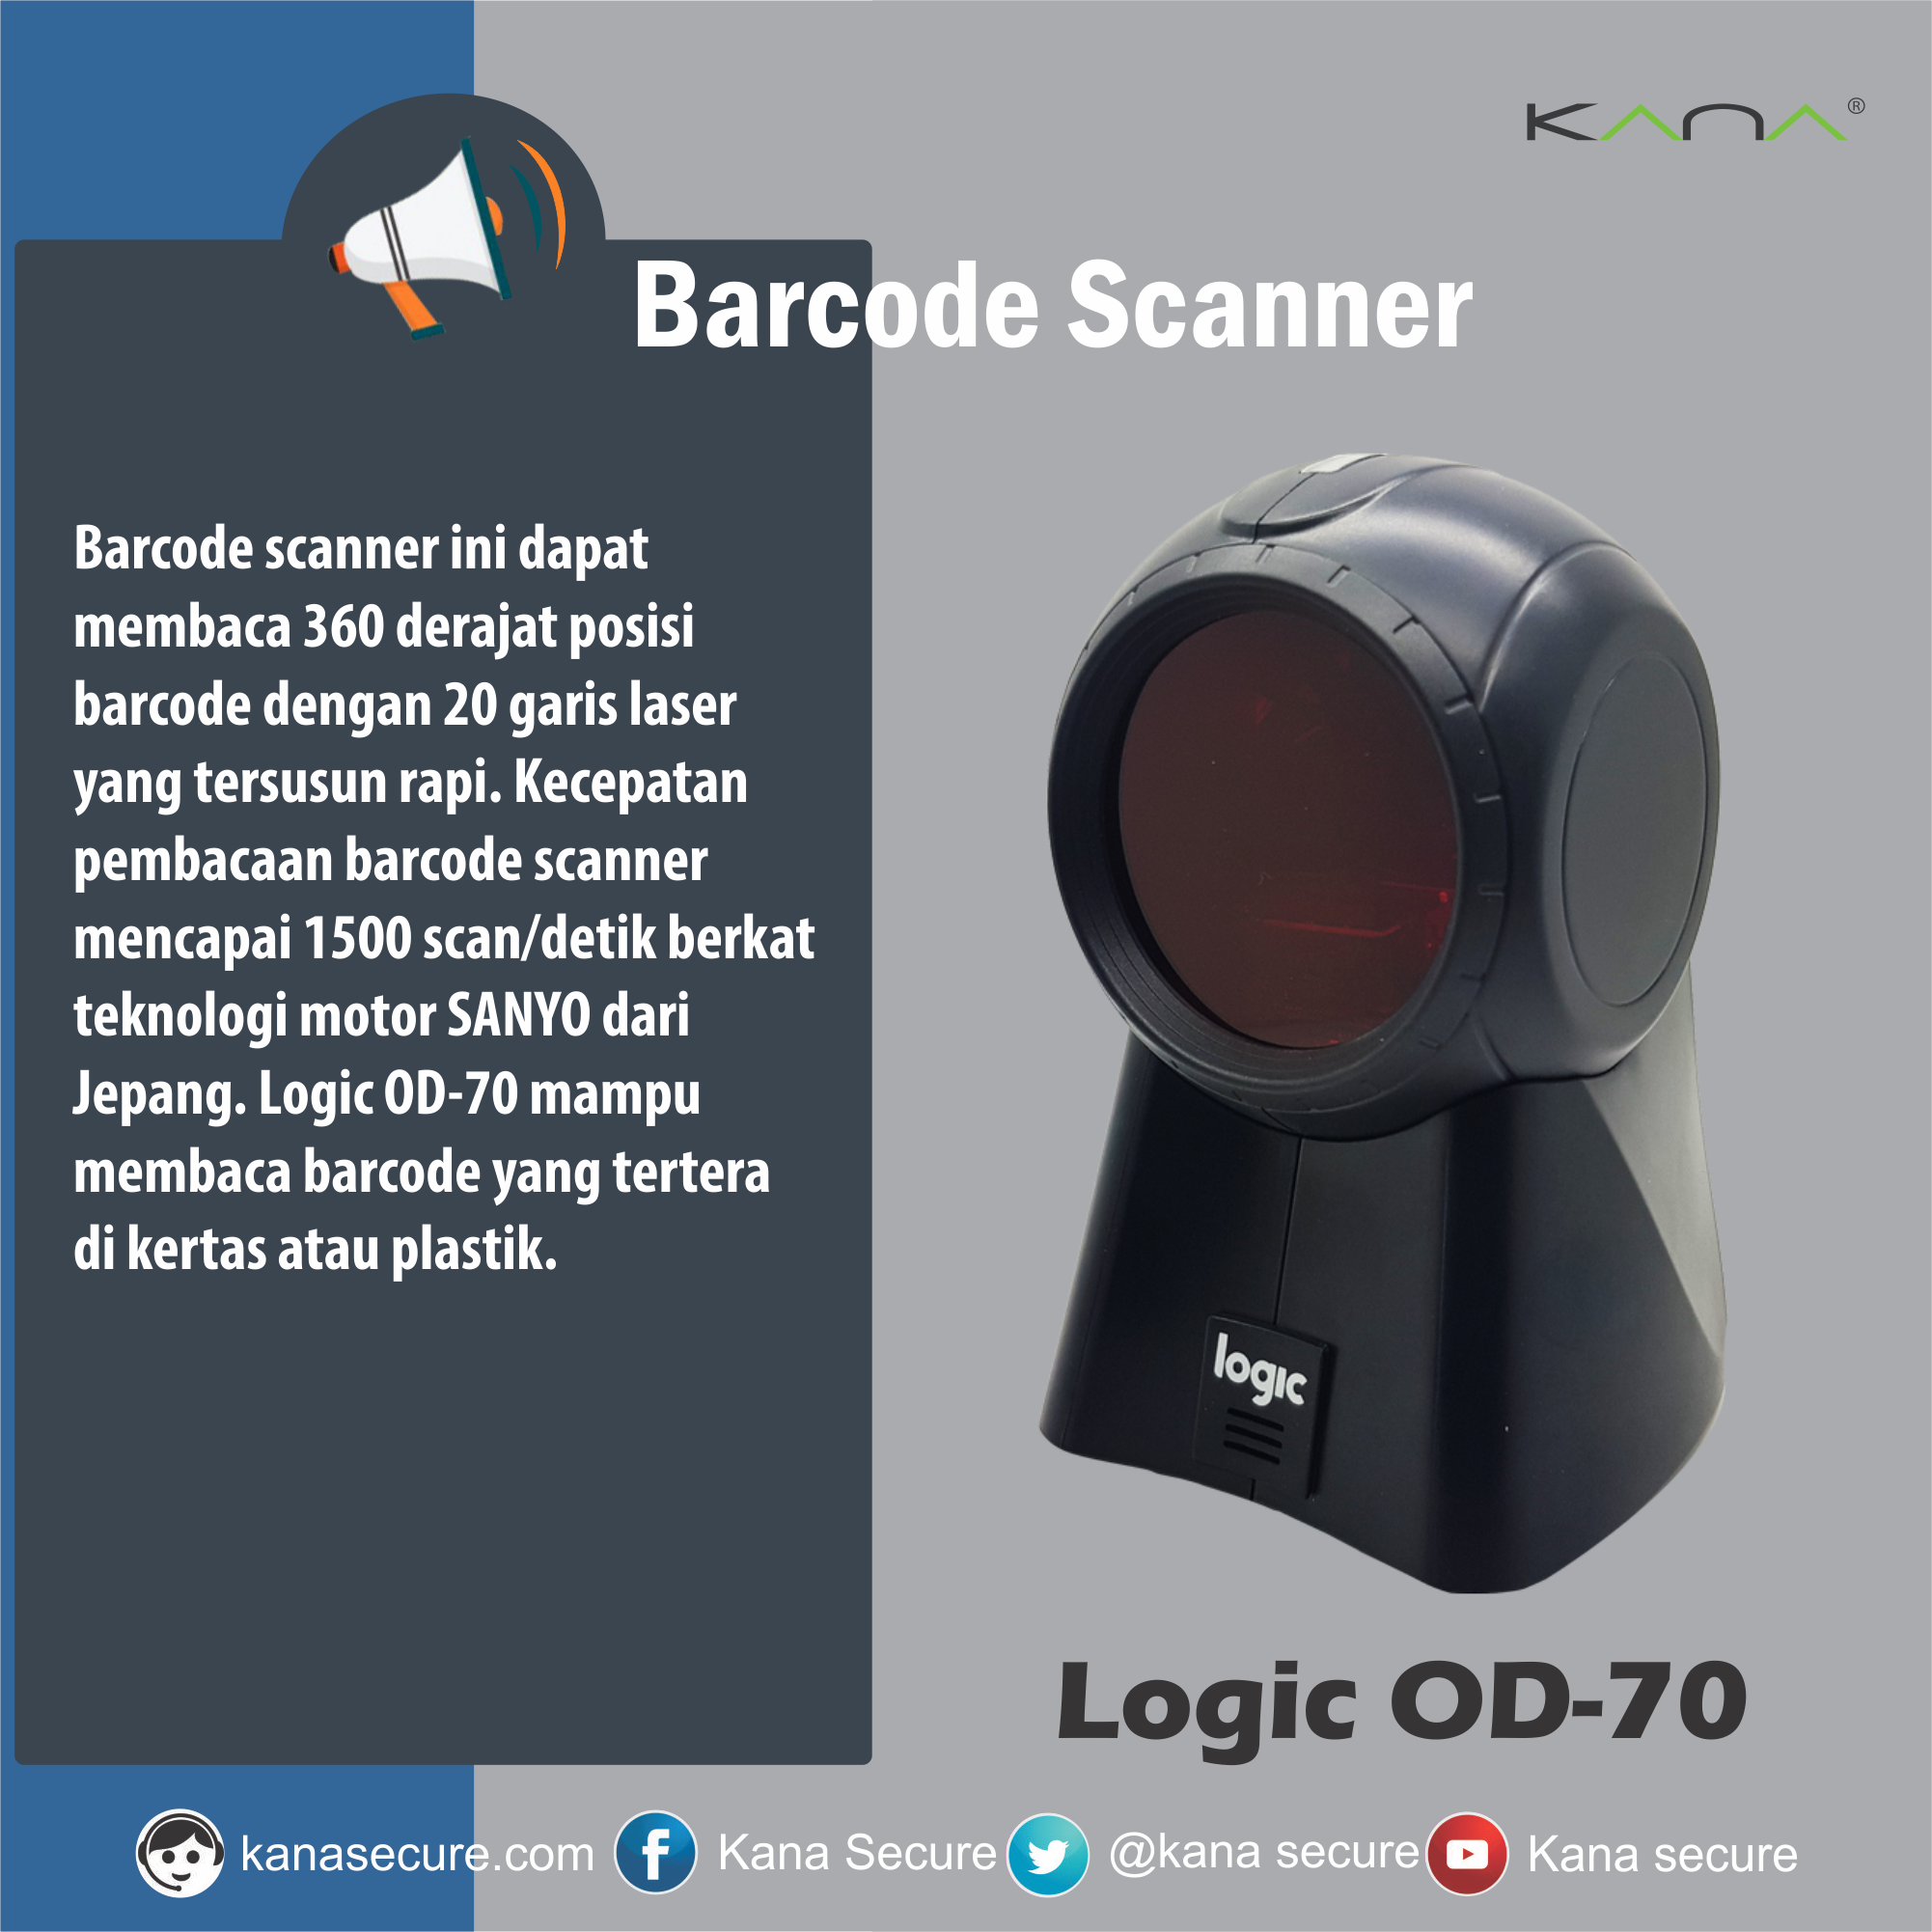 "Kana Secure on Twitter ""New barcode scanner from Kana Secure Check this out on Barcode barcodescanner Scanner supermarket"